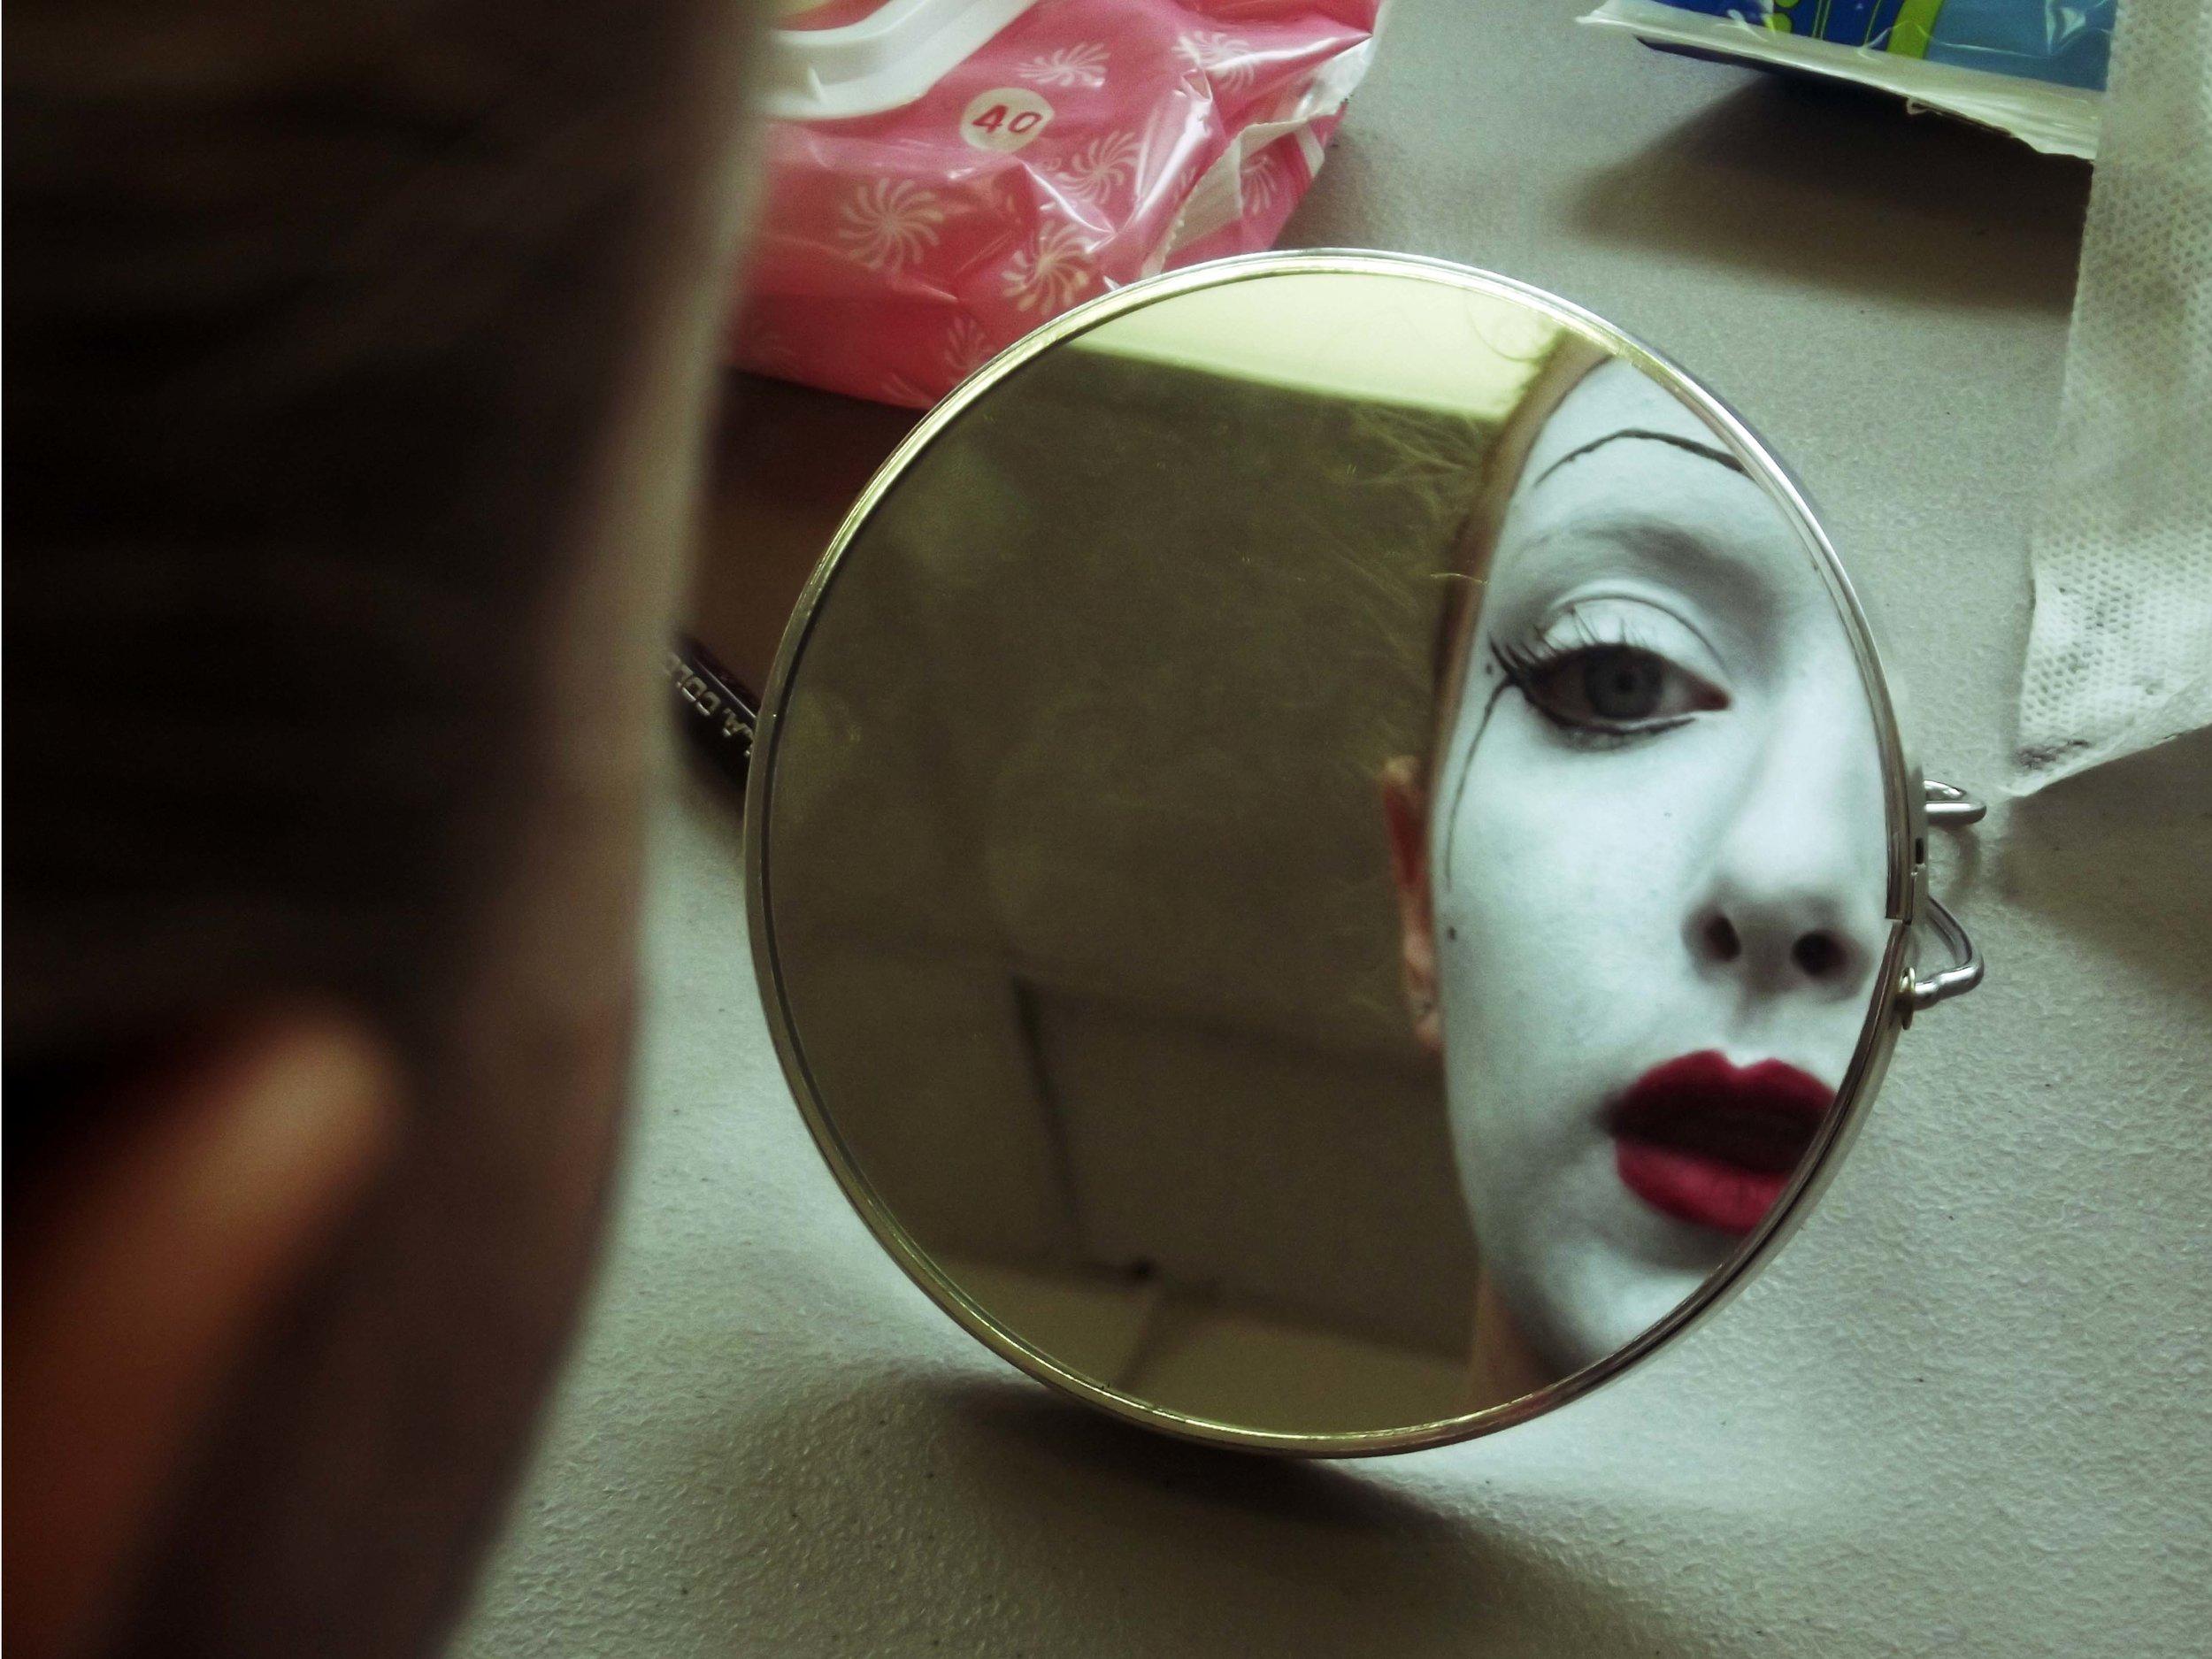 naomi mirror_edited-1.jpg